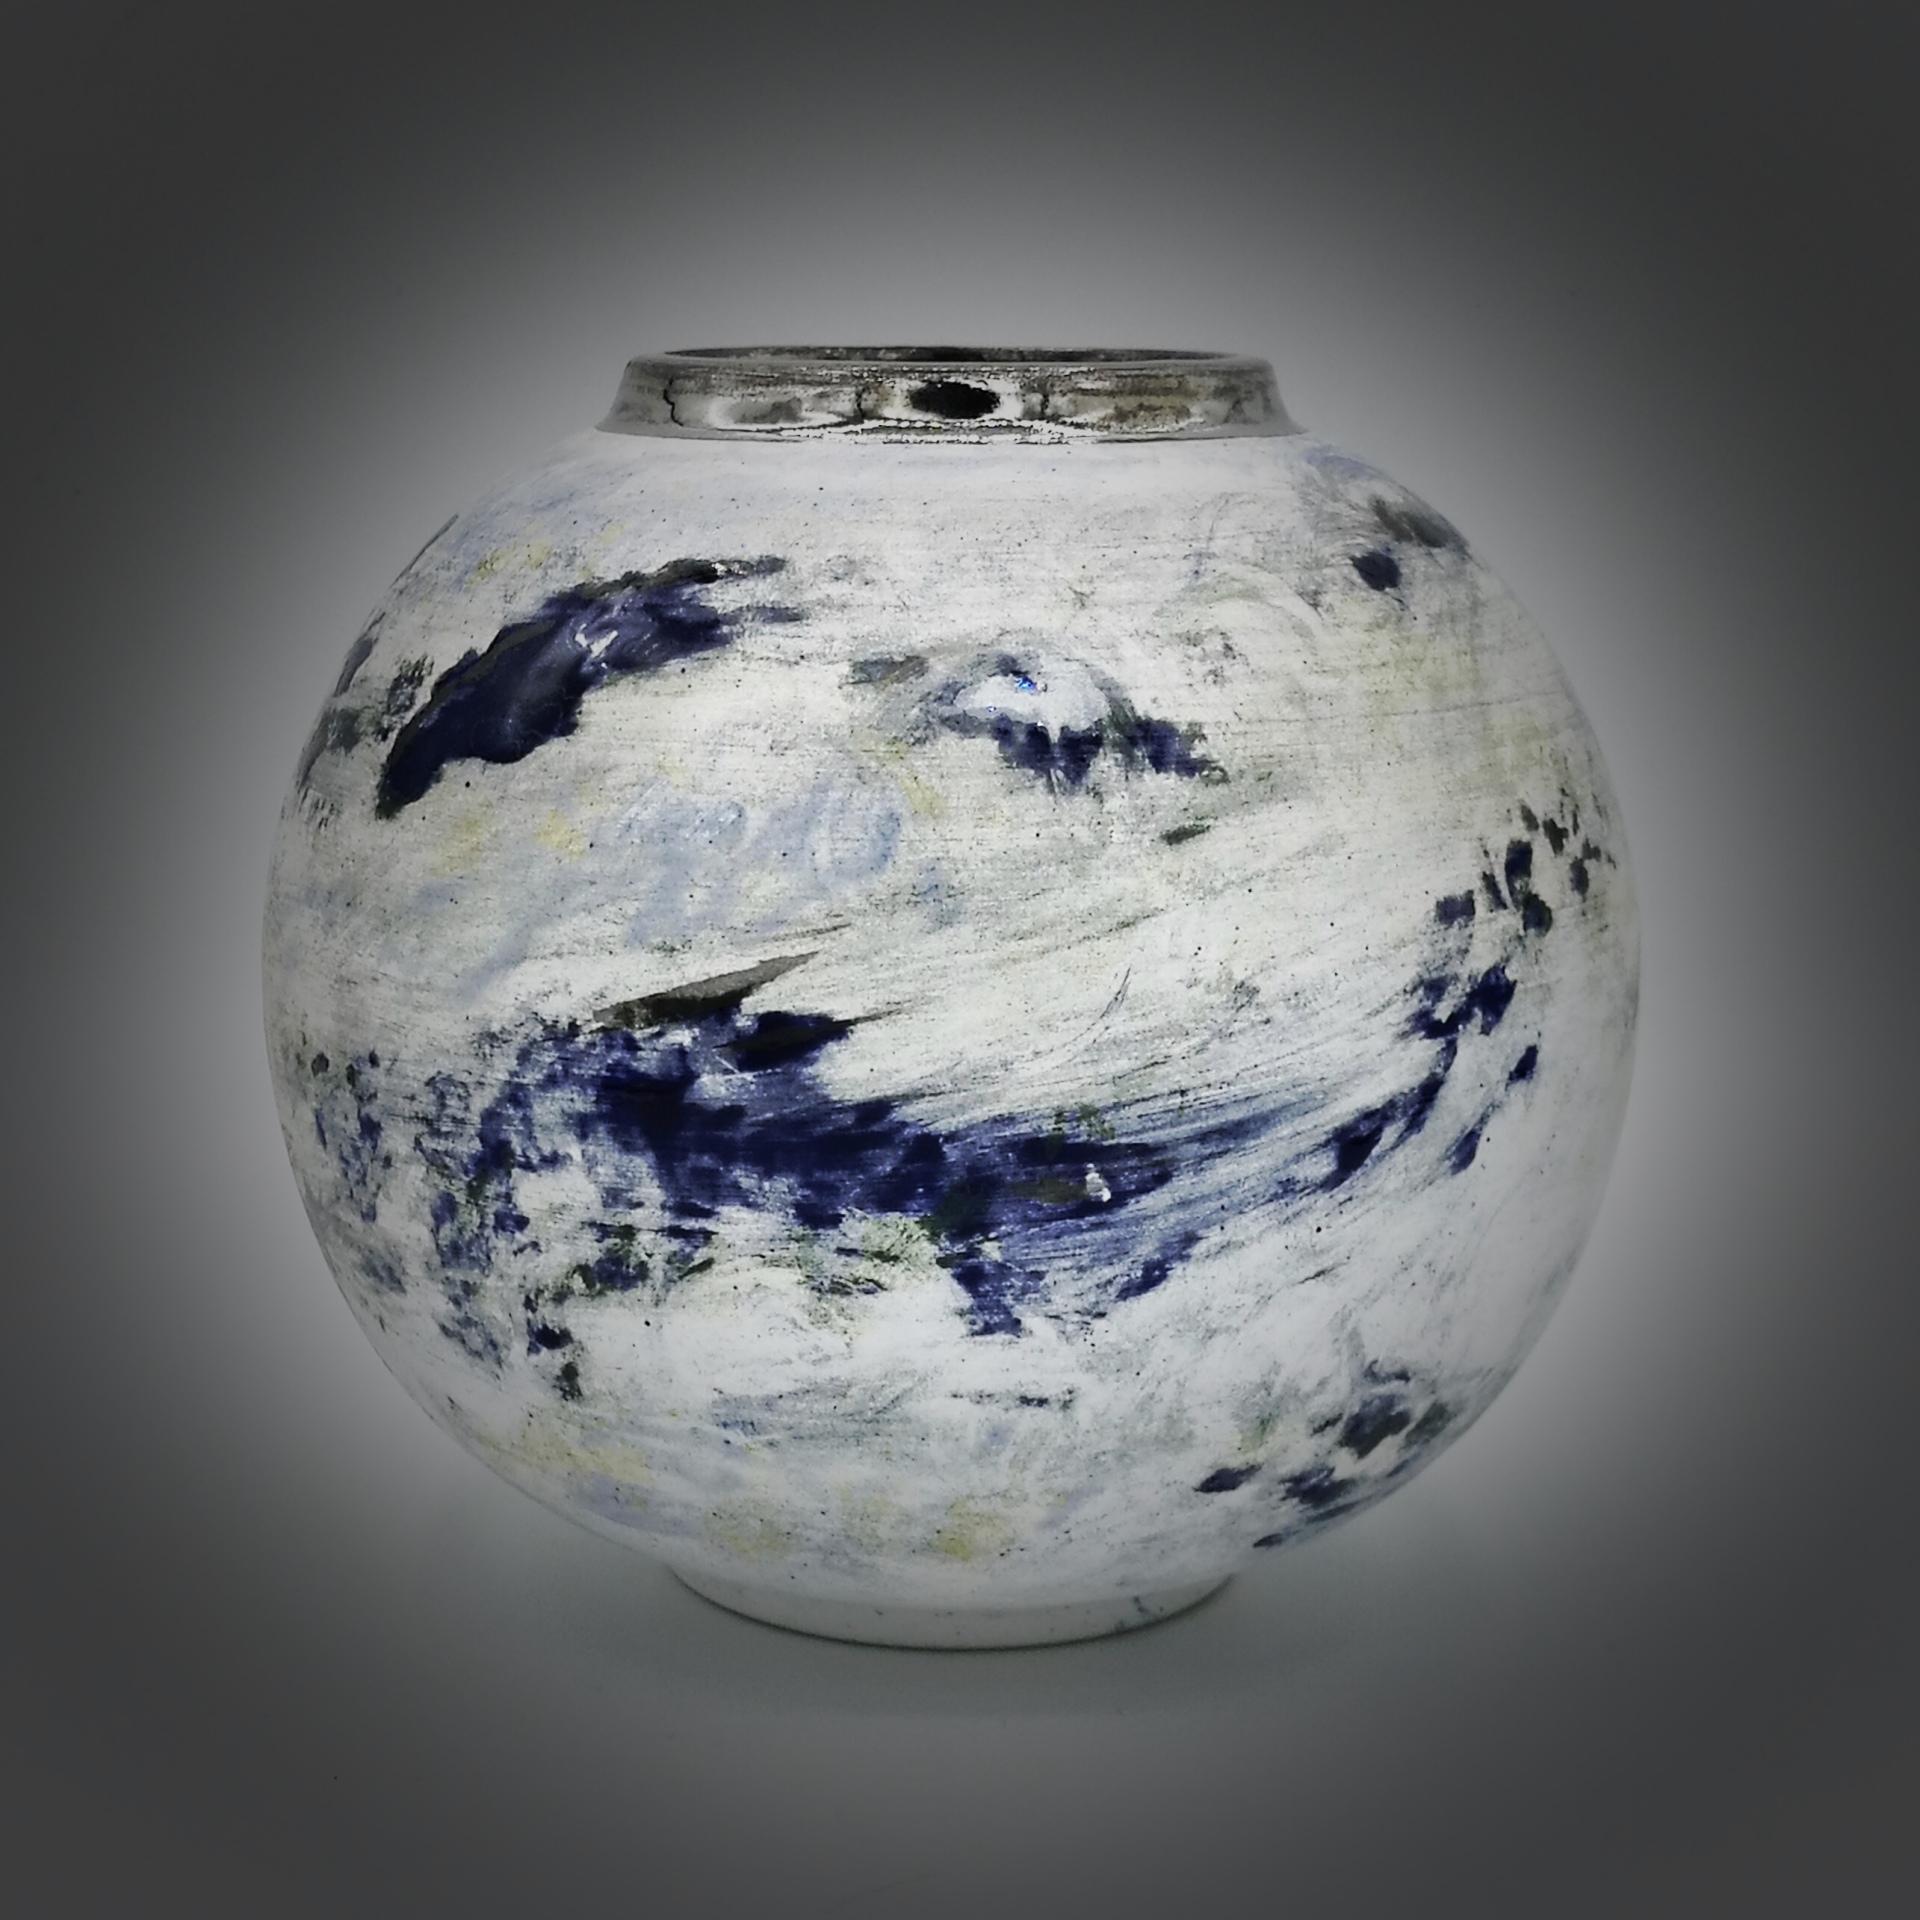 British UK United Kingdom Wales Ceramic Artist Studio Potter Sea Globe Pembrokeshire Coast National Park Storm